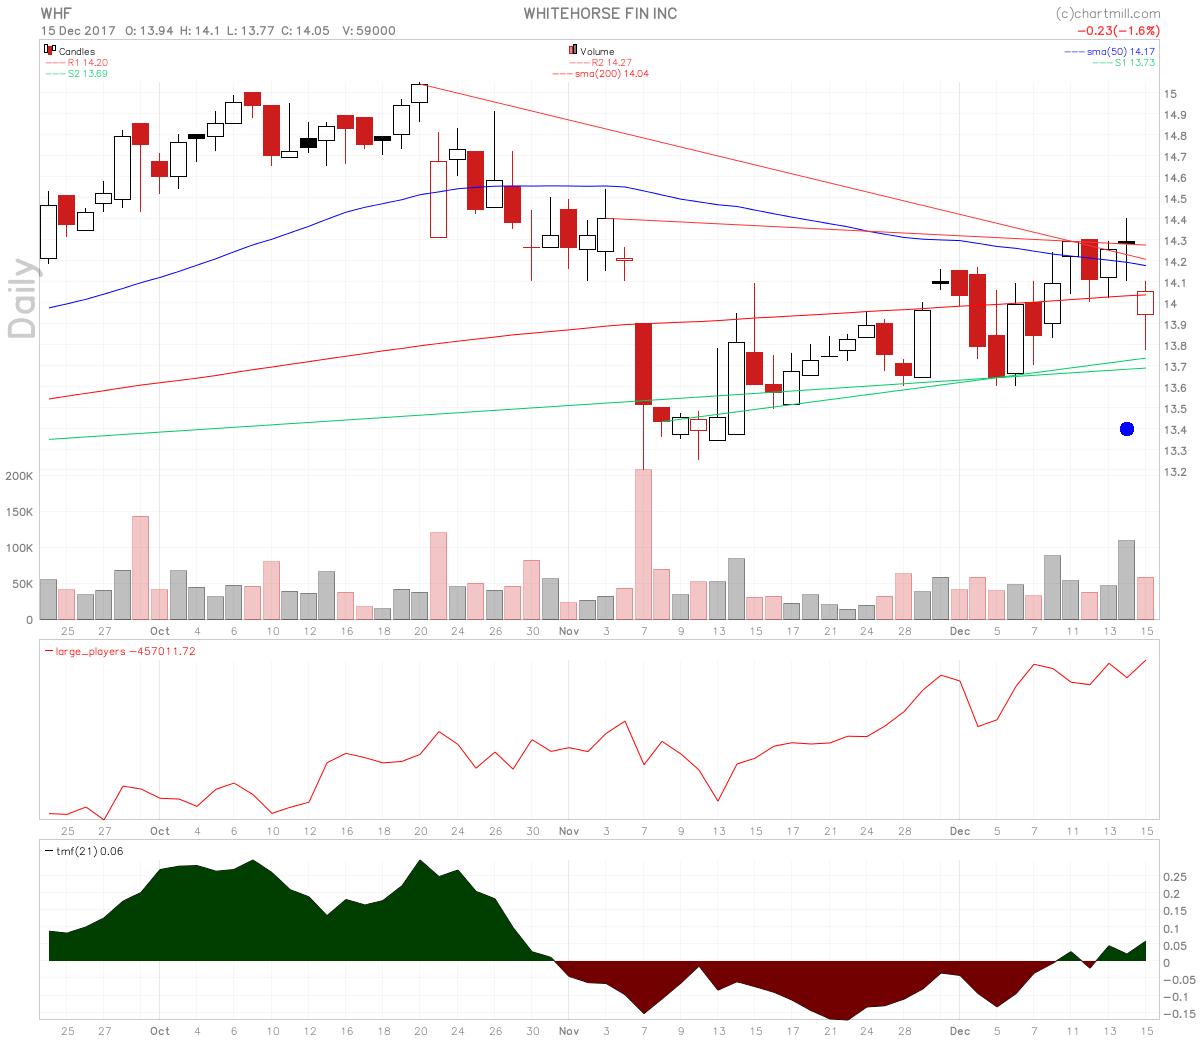 WhiteHorse Finance Stock Rising Large Players Volume